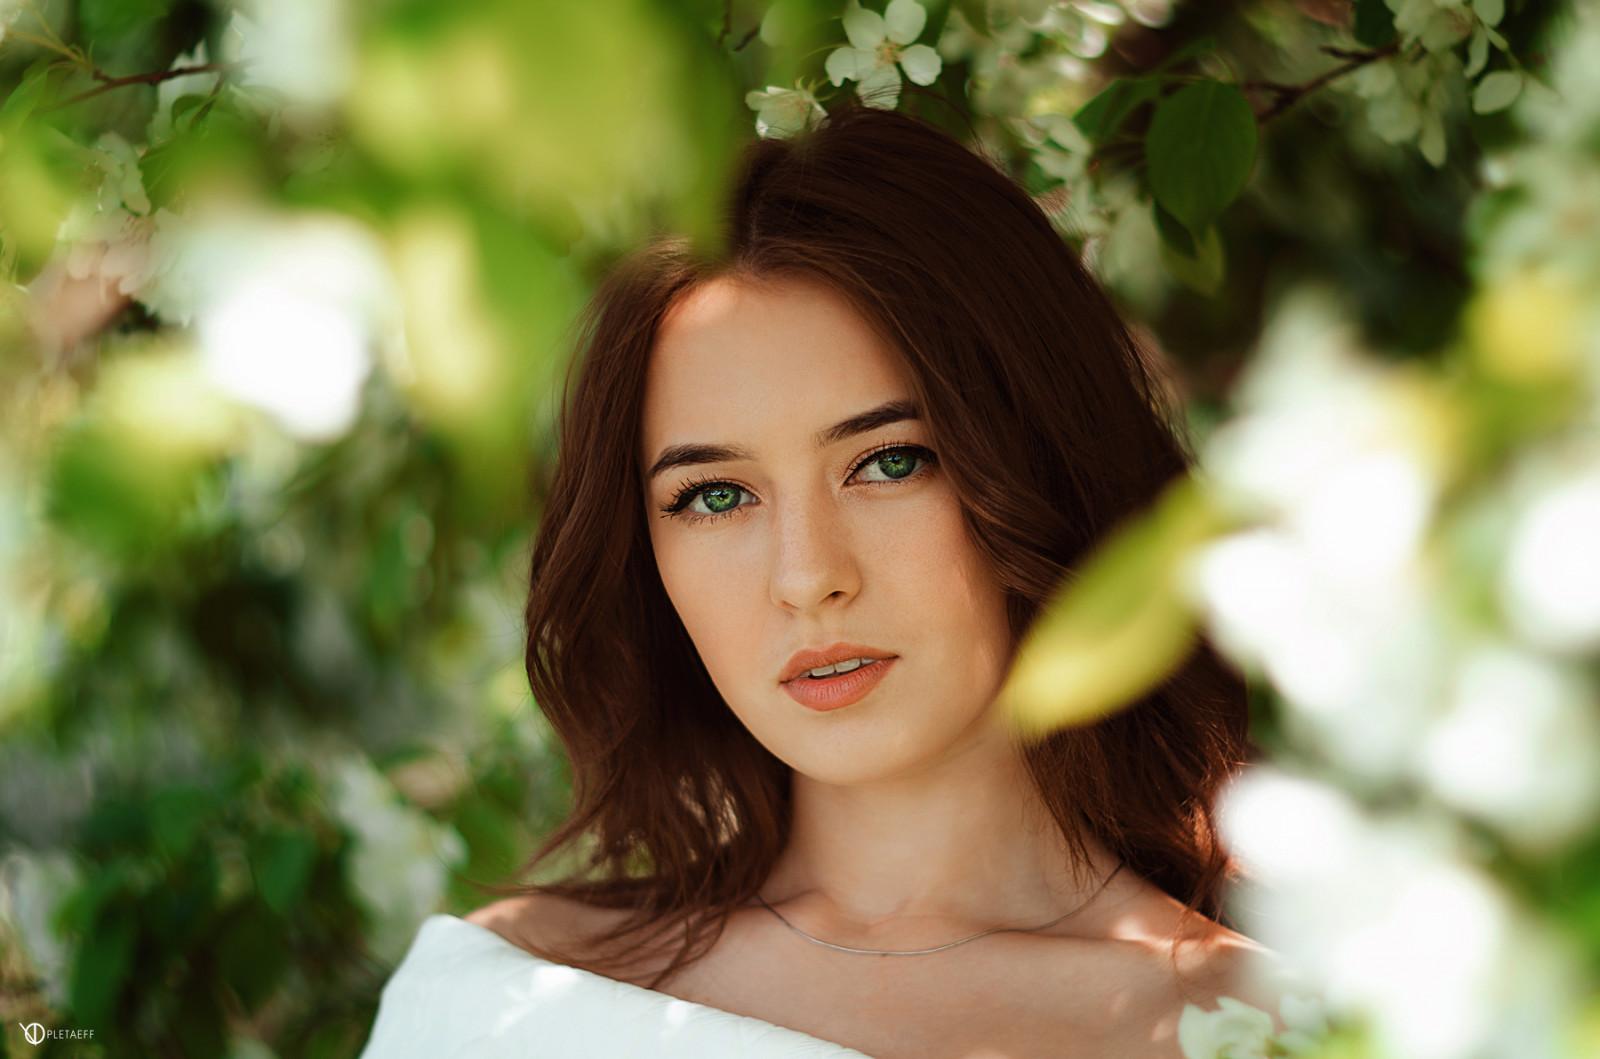 Kate Barry - Portraits | Kate barry, Portrait, Isabelle adjani